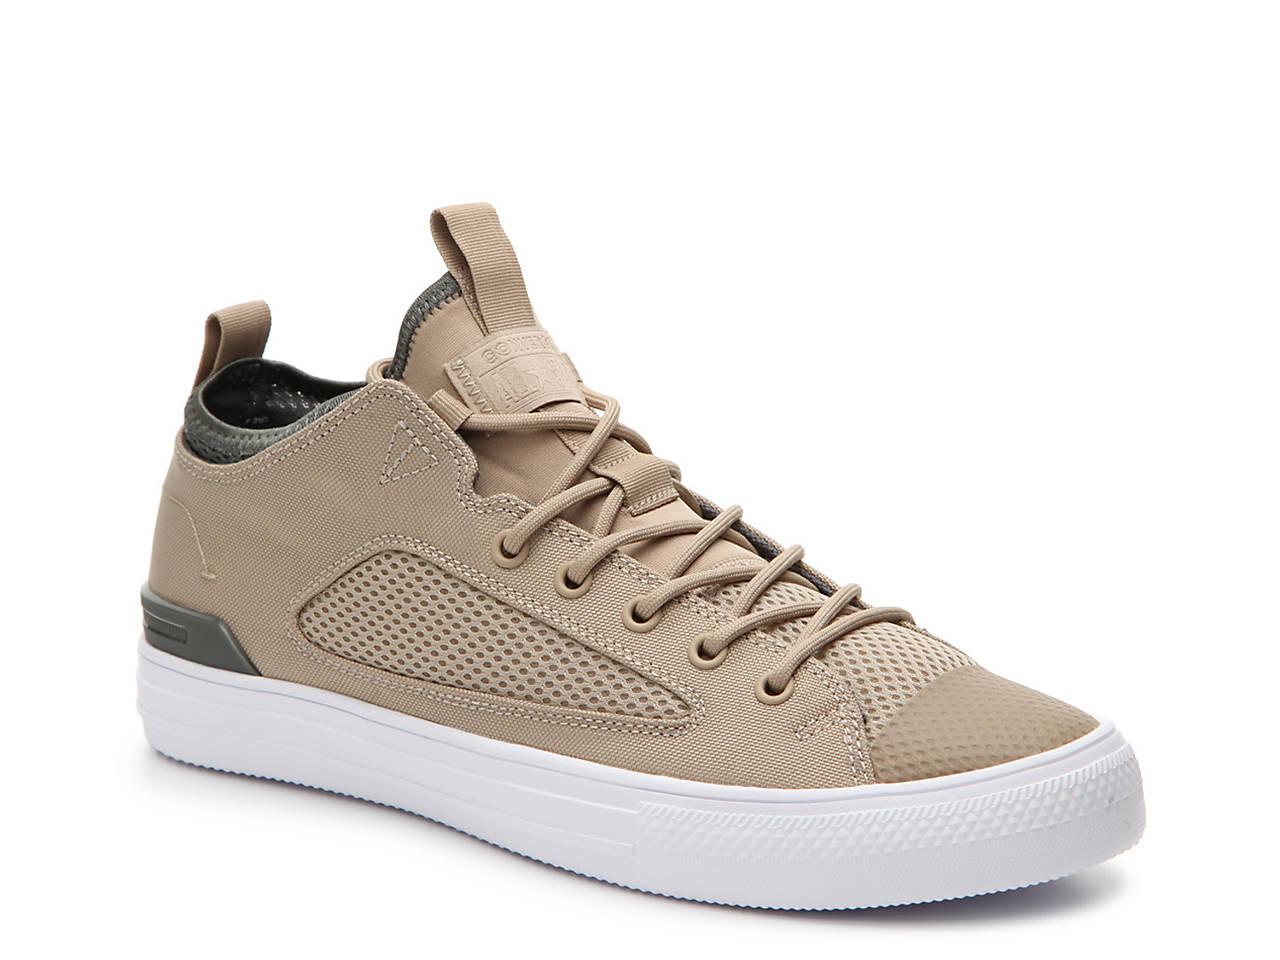 Converse Chuck Taylor All Star Ultra Lite Mid-Top Sneaker - Women s ... ea08cbb8025